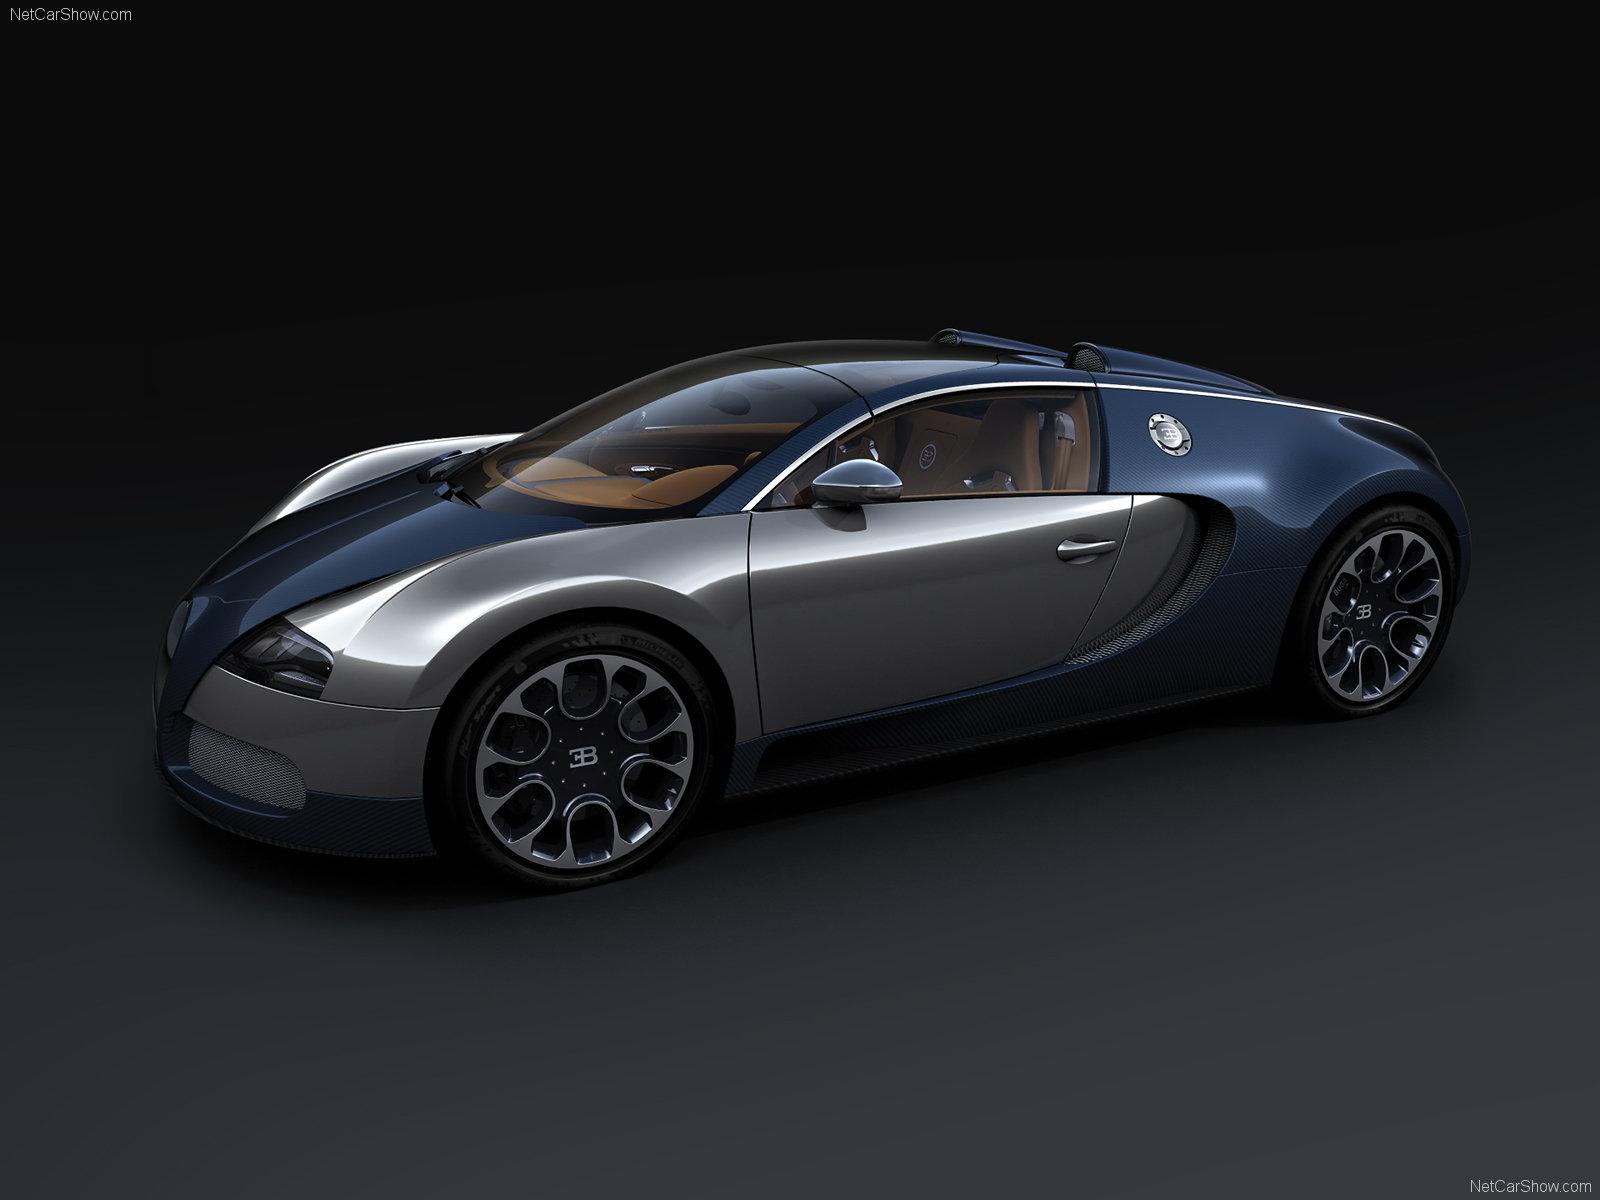 bugatti veyron grand sport sang bleu photos photogallery with 7 pics. Black Bedroom Furniture Sets. Home Design Ideas